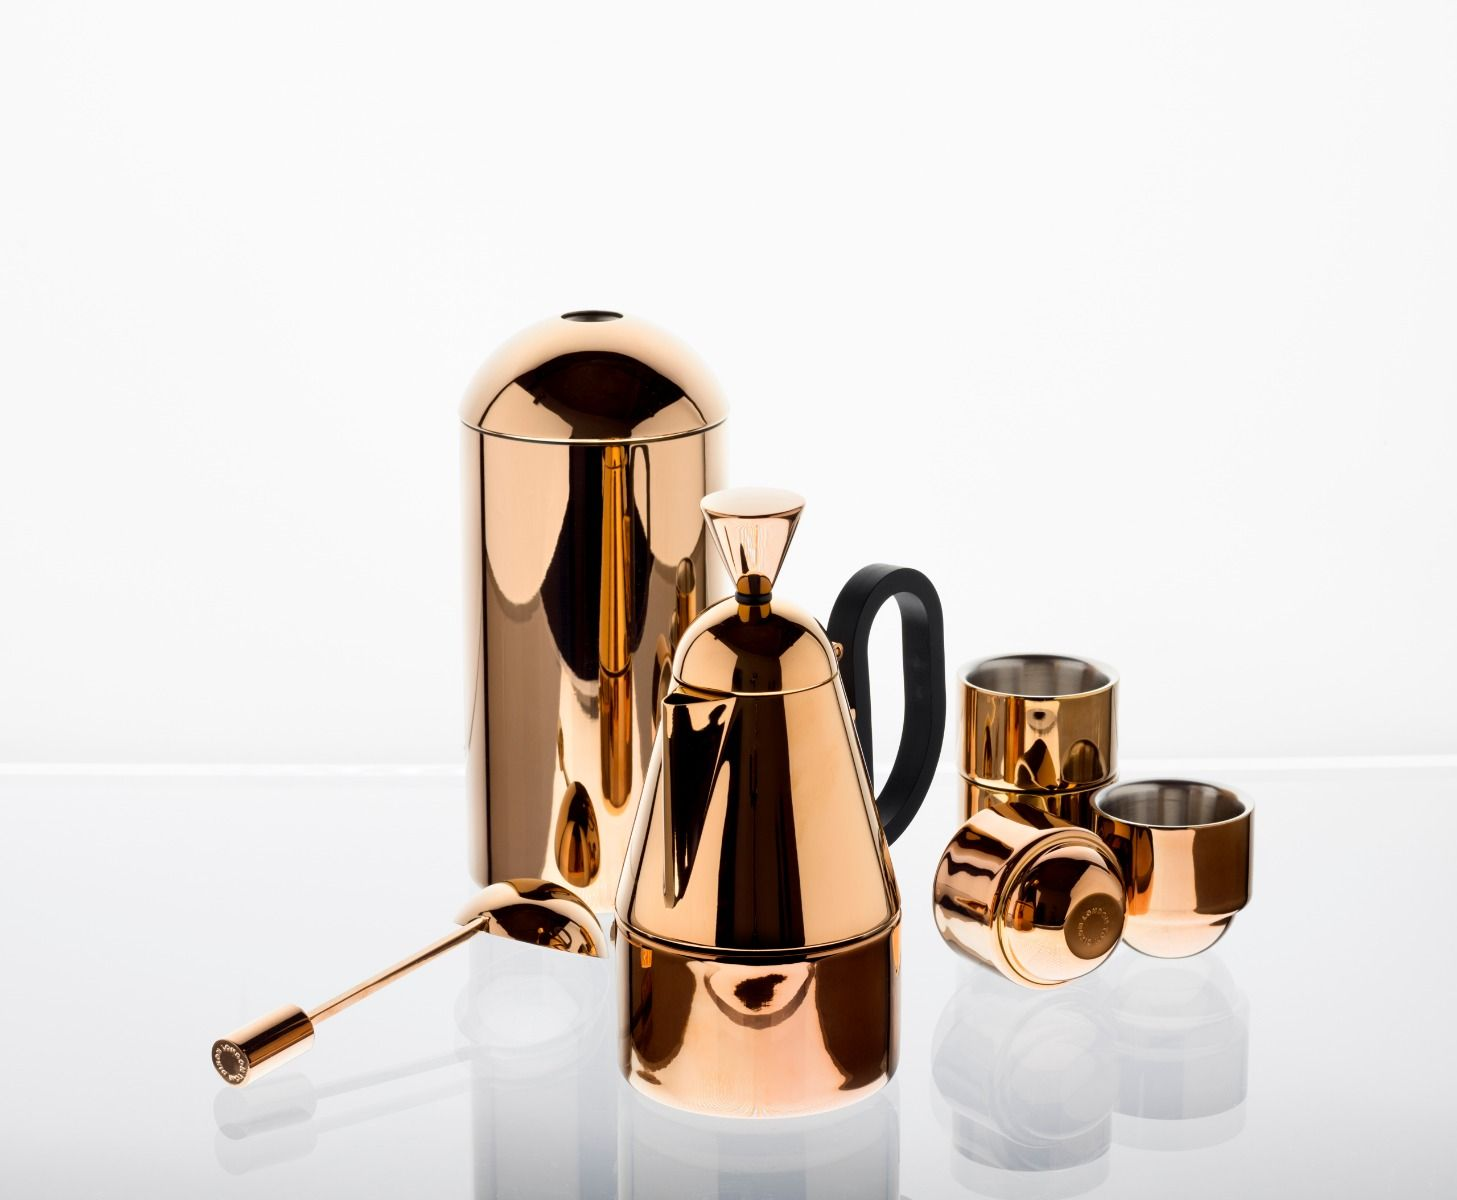 Coffee Maker With Copper Heating Element : Satchel: Tom Dixon Stovetop Copper Espresso Coffee Maker